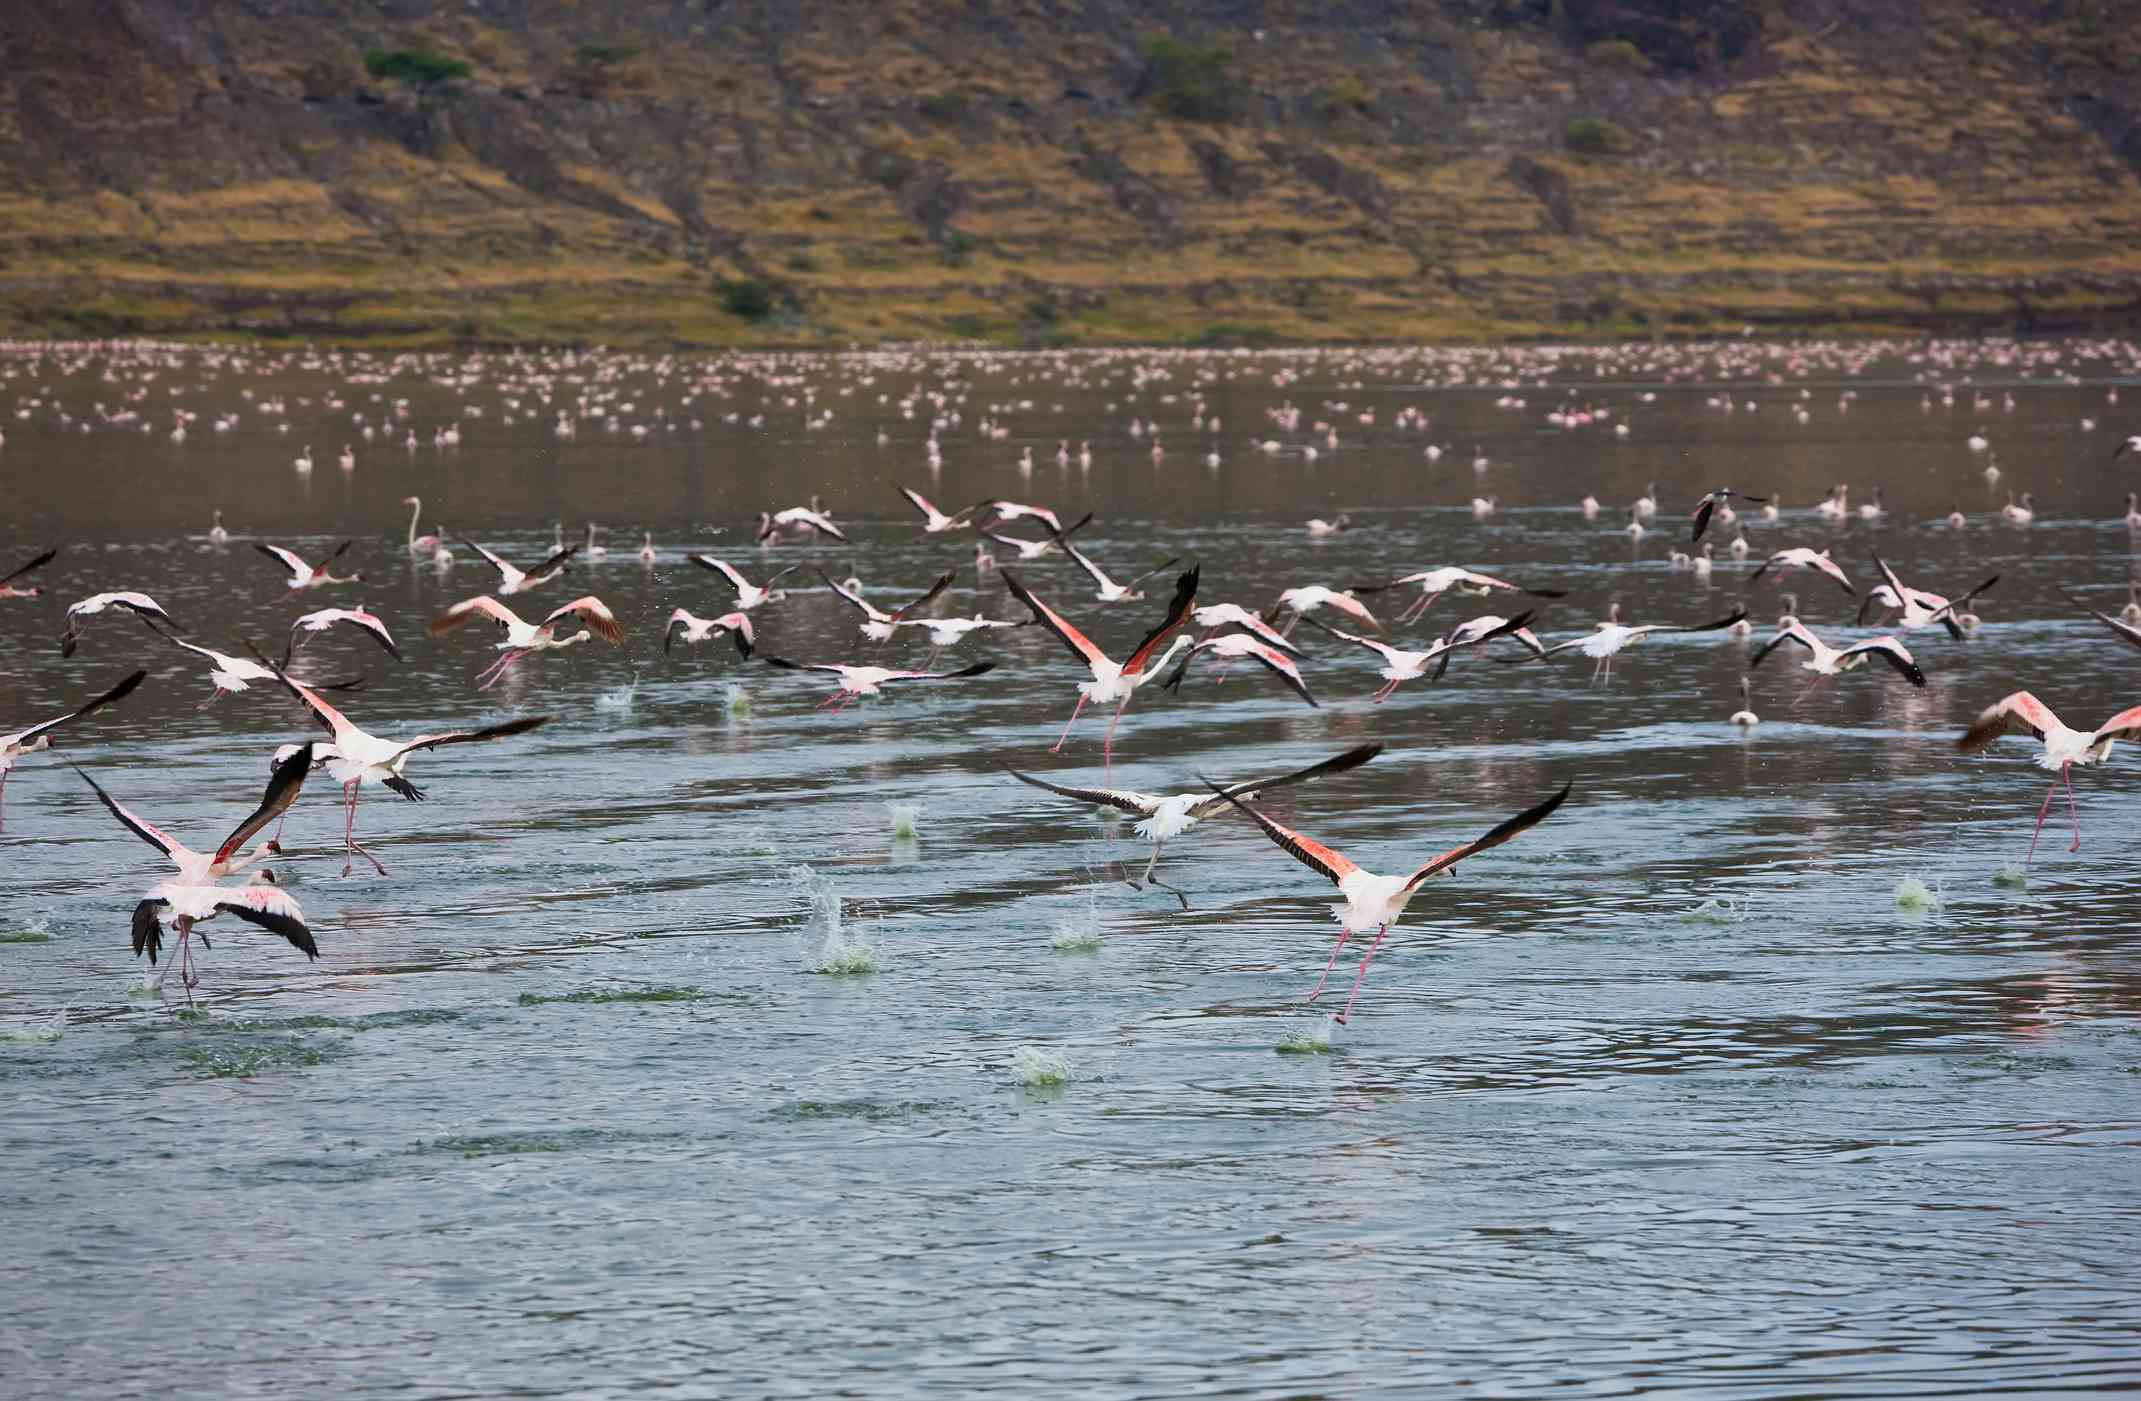 Flamingos flying over a lake.